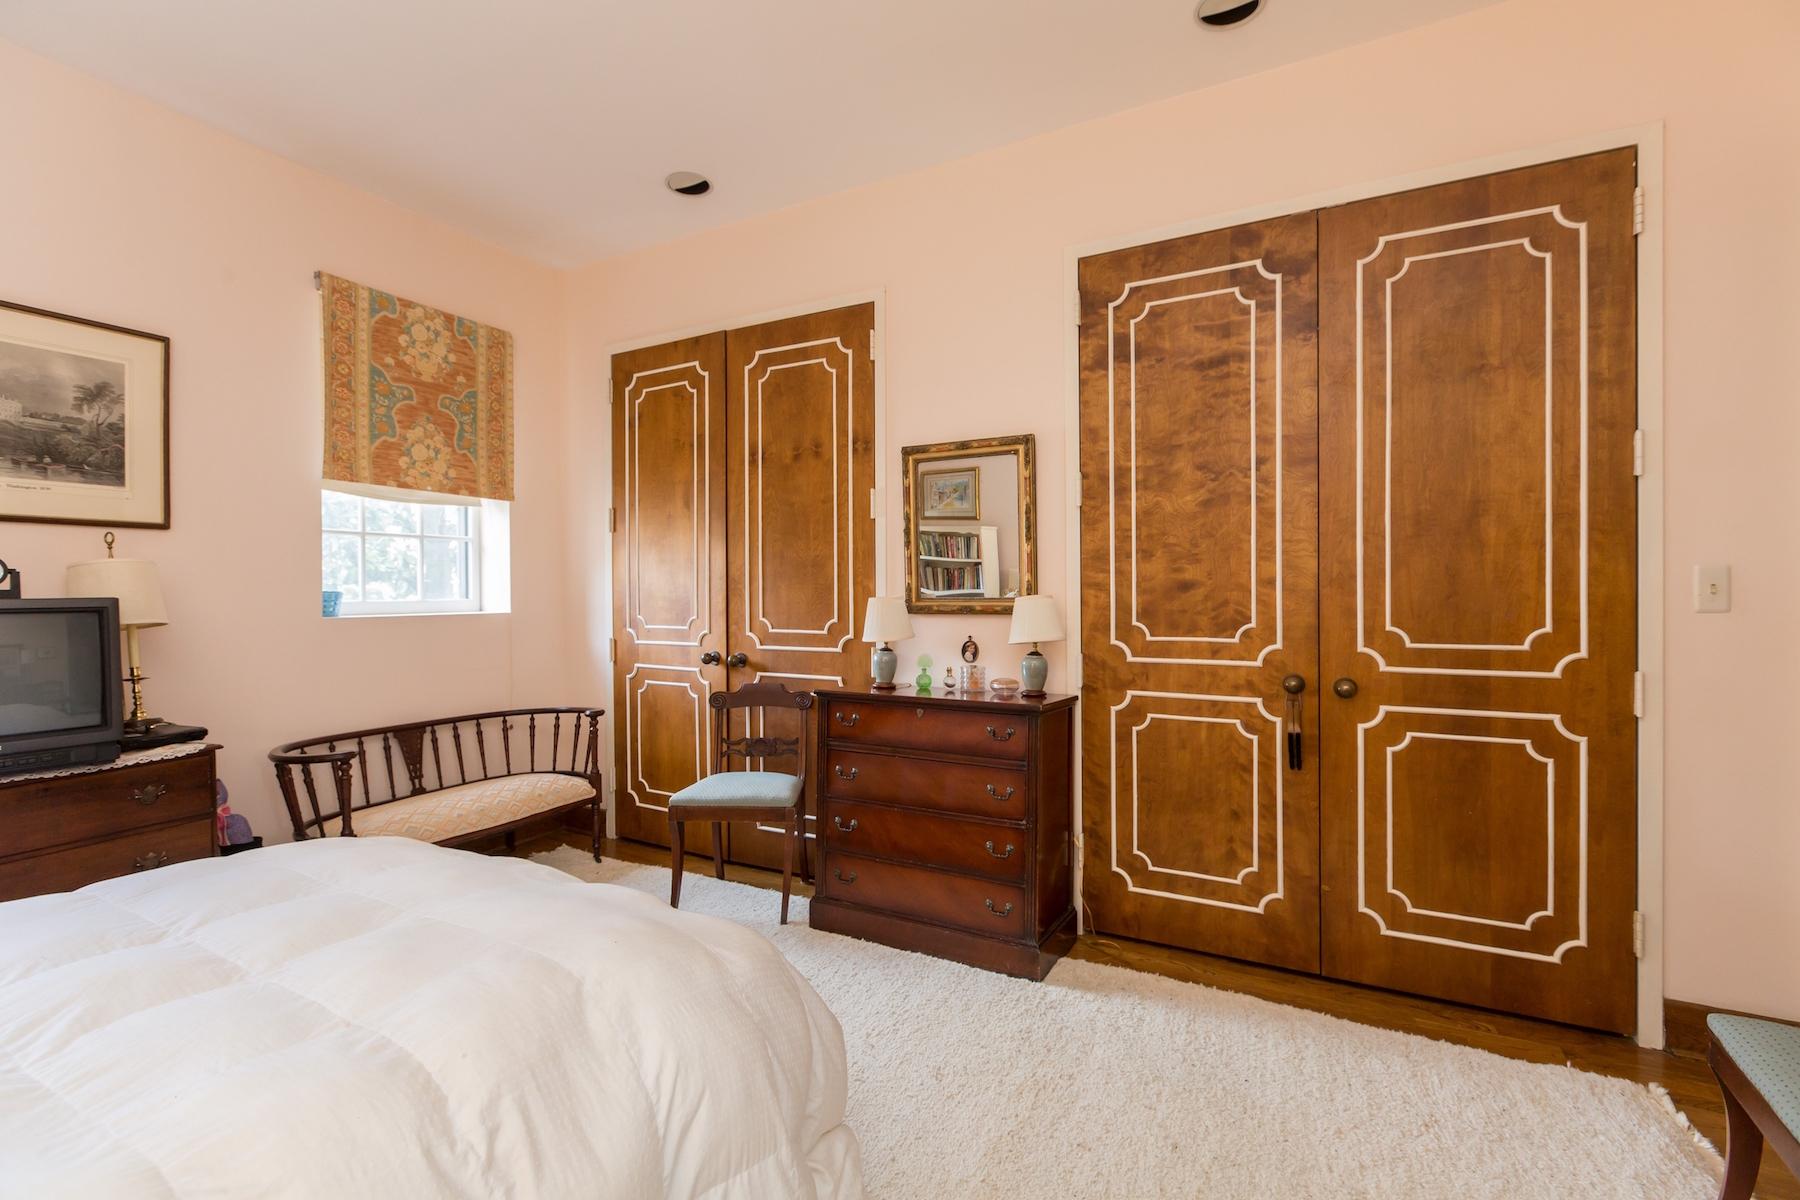 Additional photo for property listing at Rarely Available: Historic Georgetown Condominium 1527 30th Street Nw B21 Washington, Περιφερεια Τησ Κολουμπια 20007 Ηνωμενεσ Πολιτειεσ